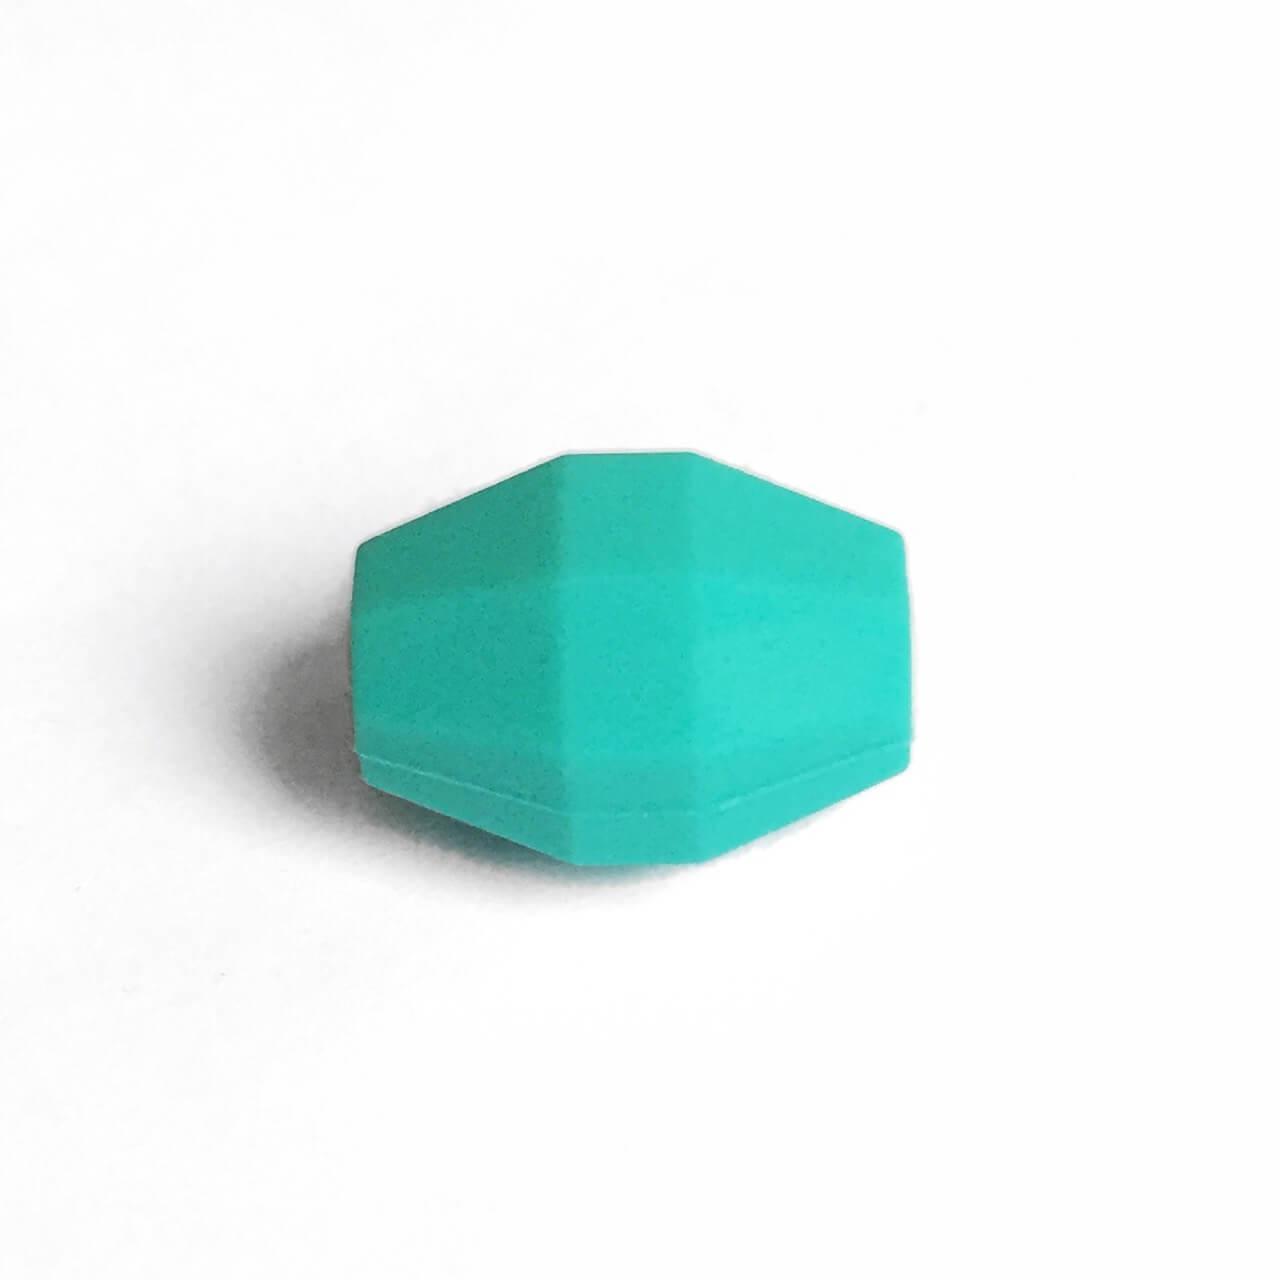 Бочка (бирюза)  бусина из силикона